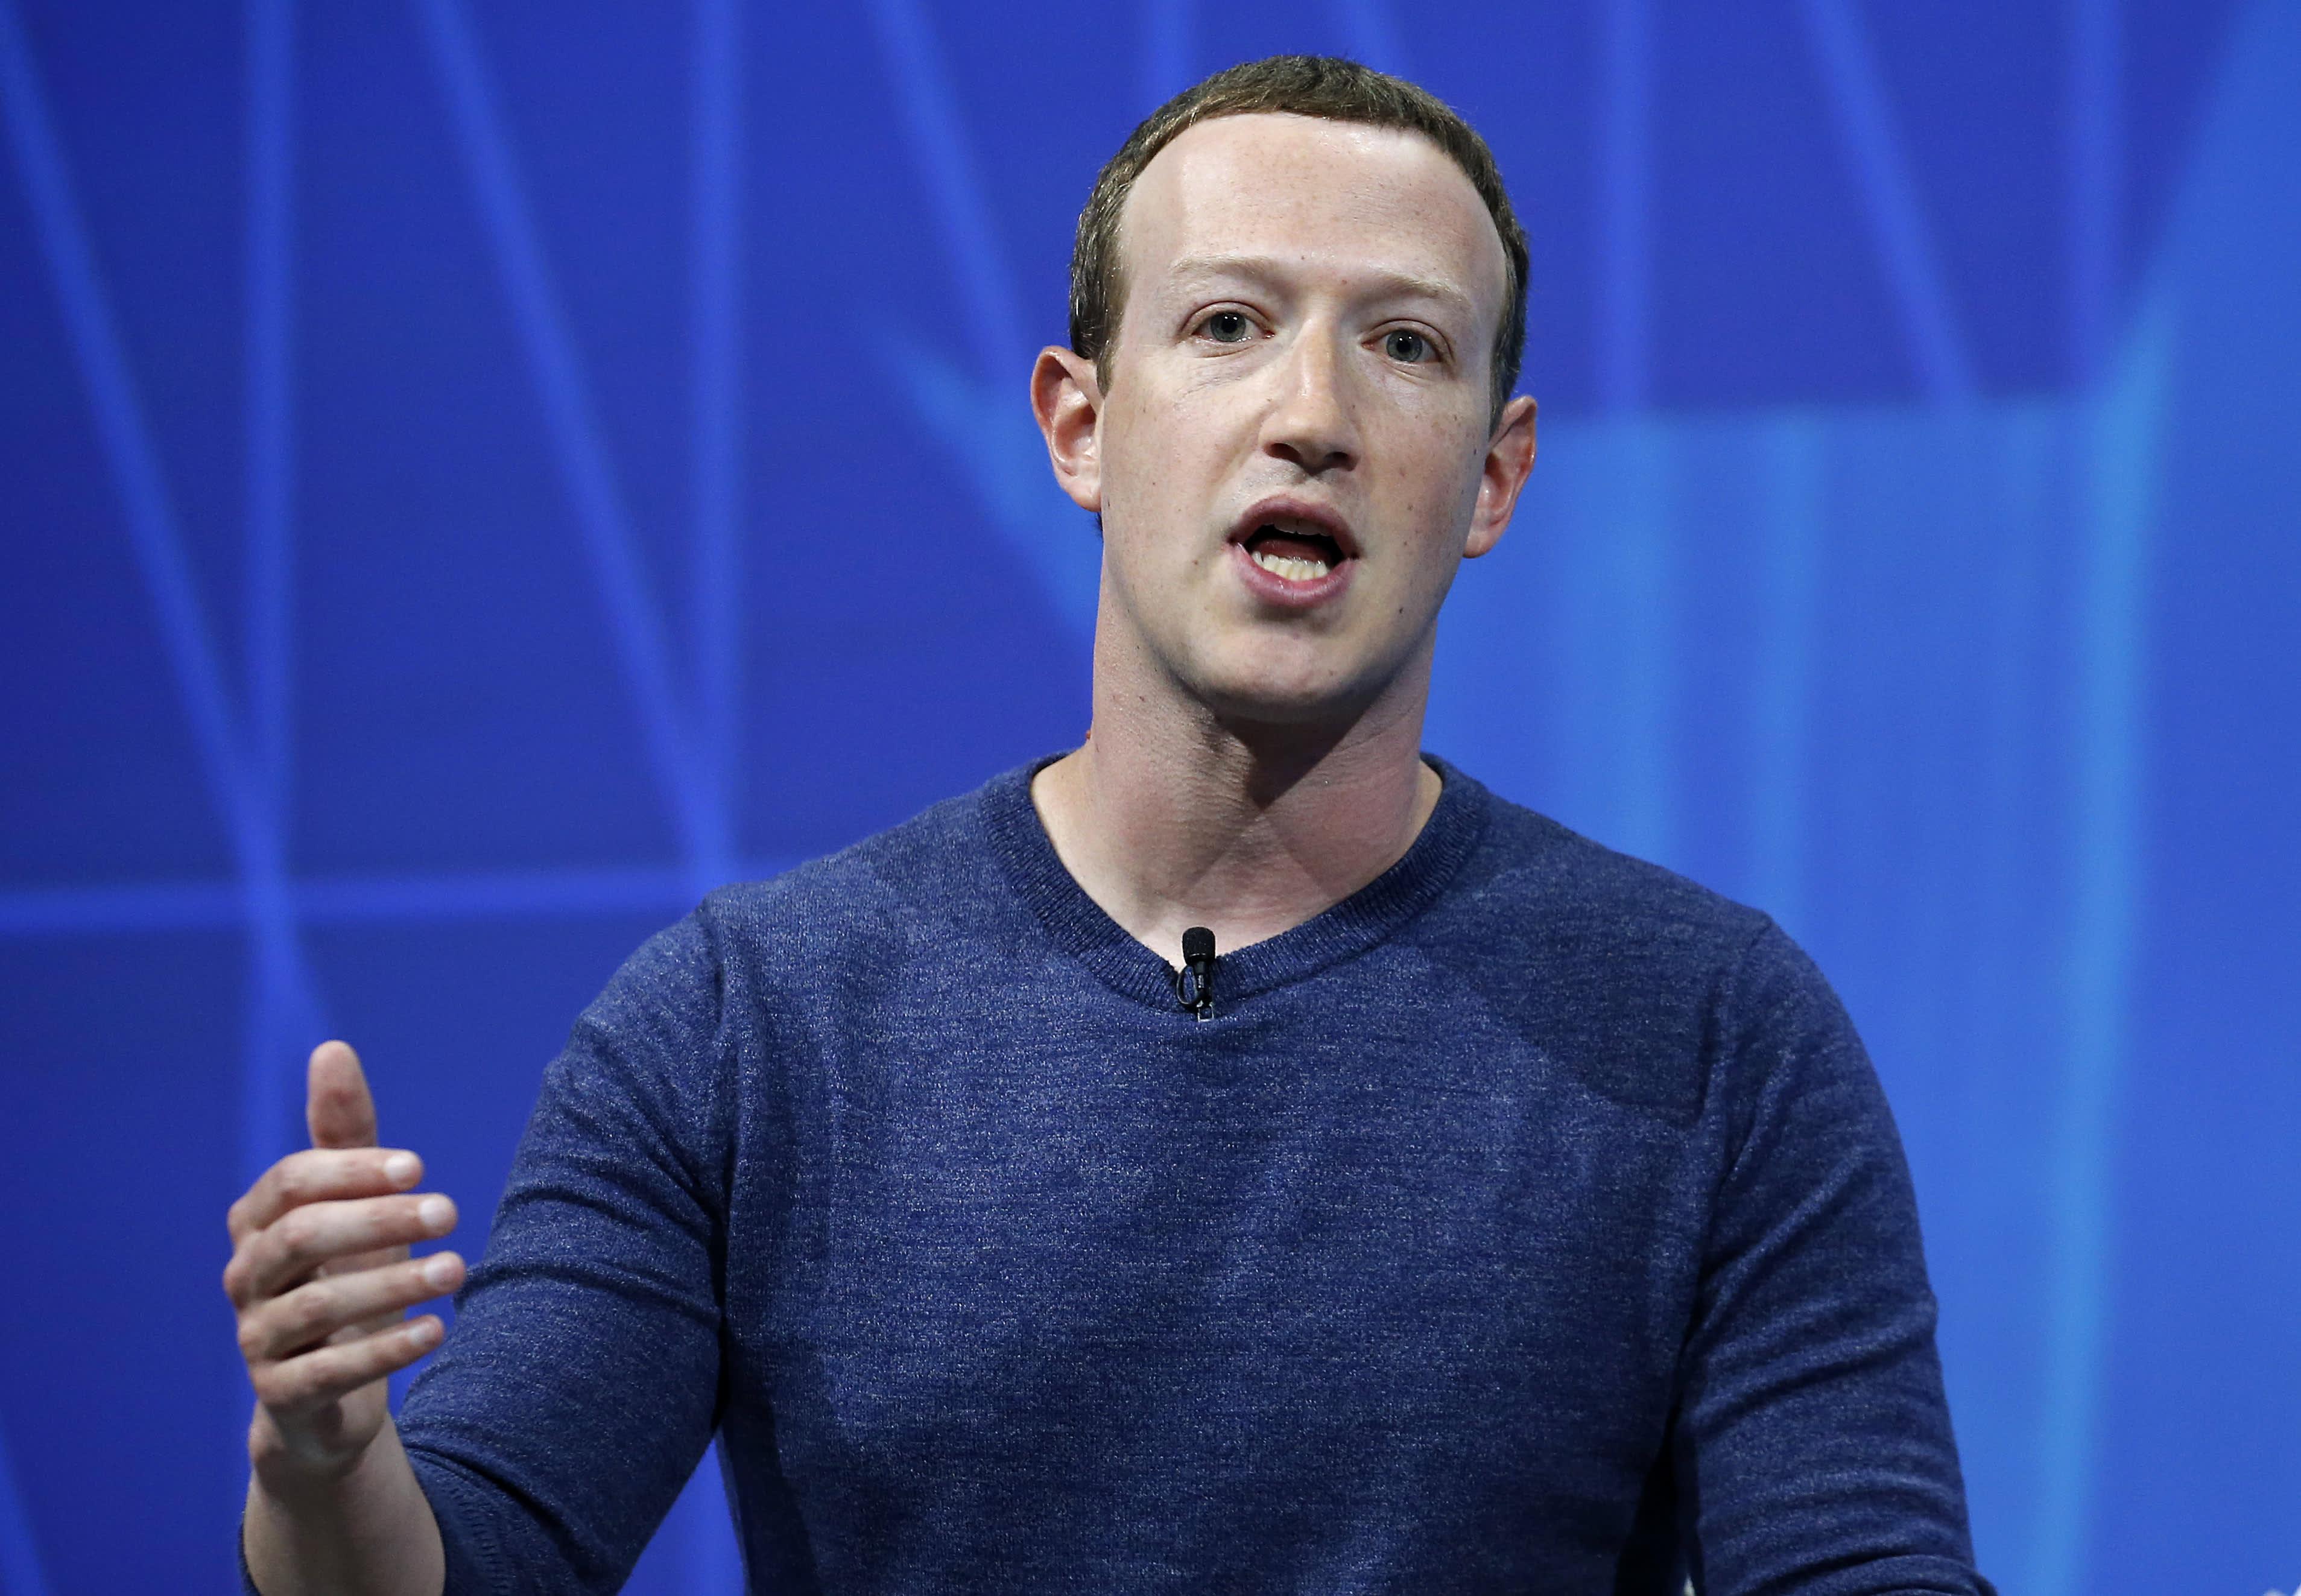 Facebook temporarily bans ads, listings for medical face masks amid coronavirus outbreak